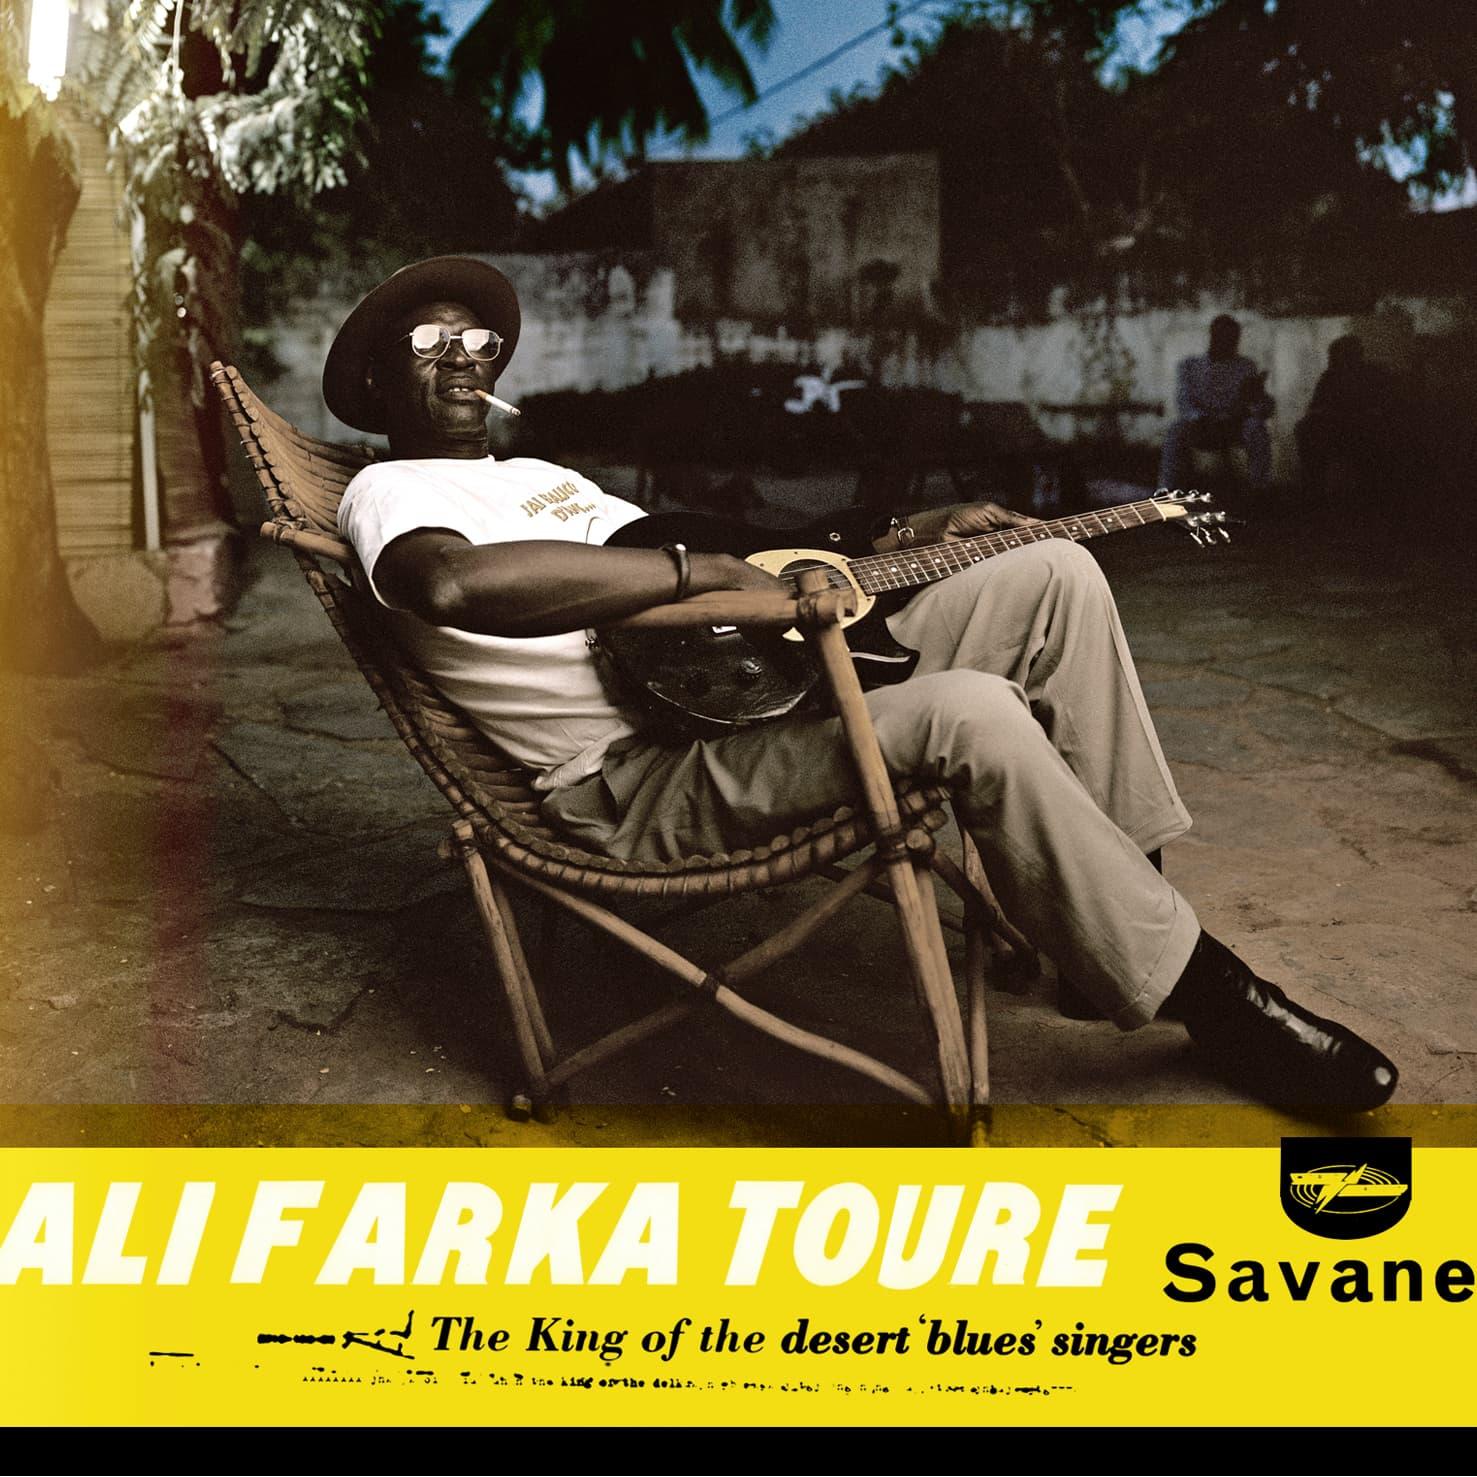 Buy Online Ali Farka Touré - Savane CD